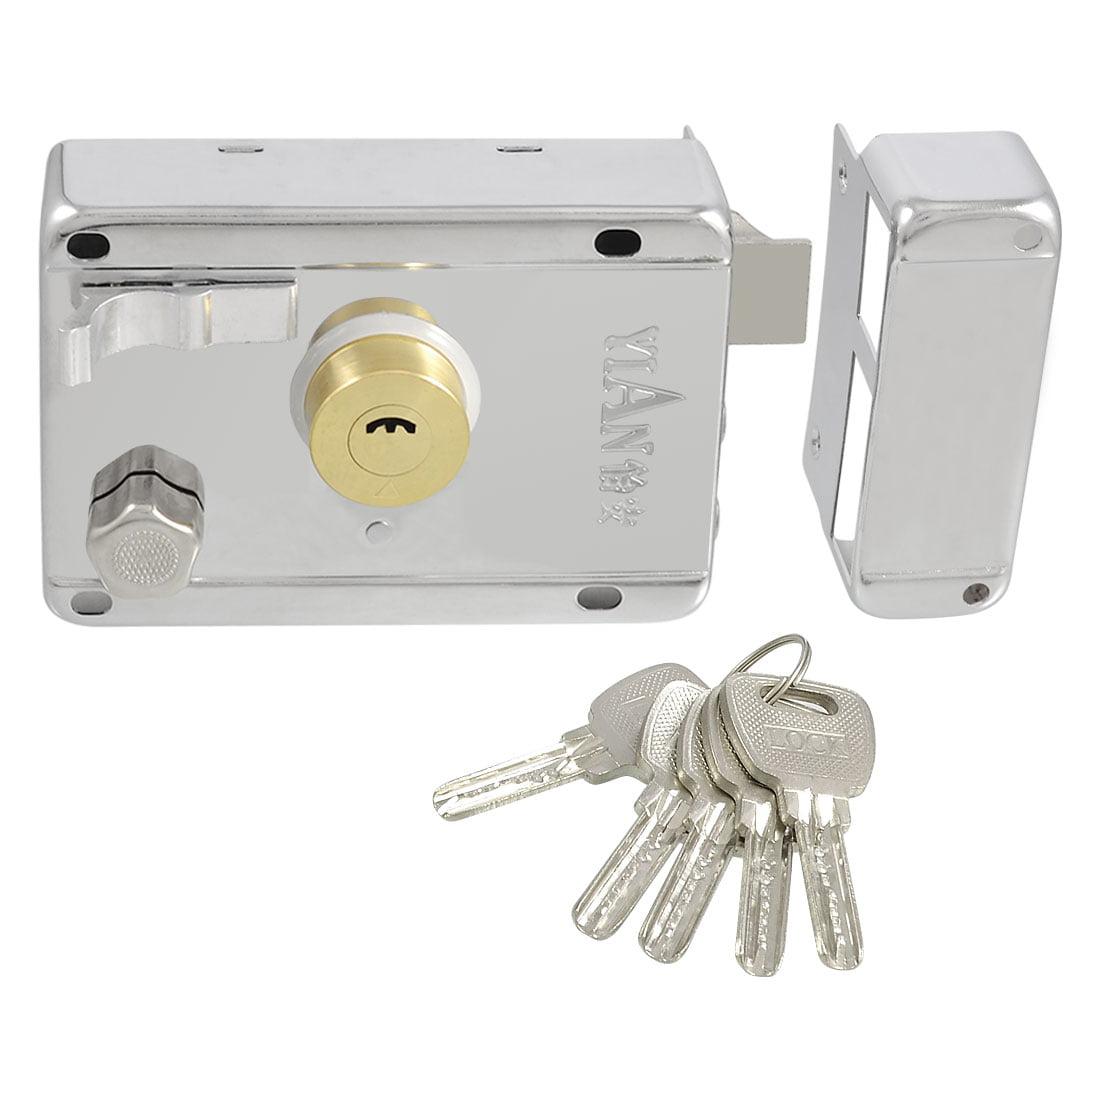 Beau Silver Tone Metal Left Hand Deadbolt Rim Night Latch Door Lock Set W 5 Keys    Walmart.com